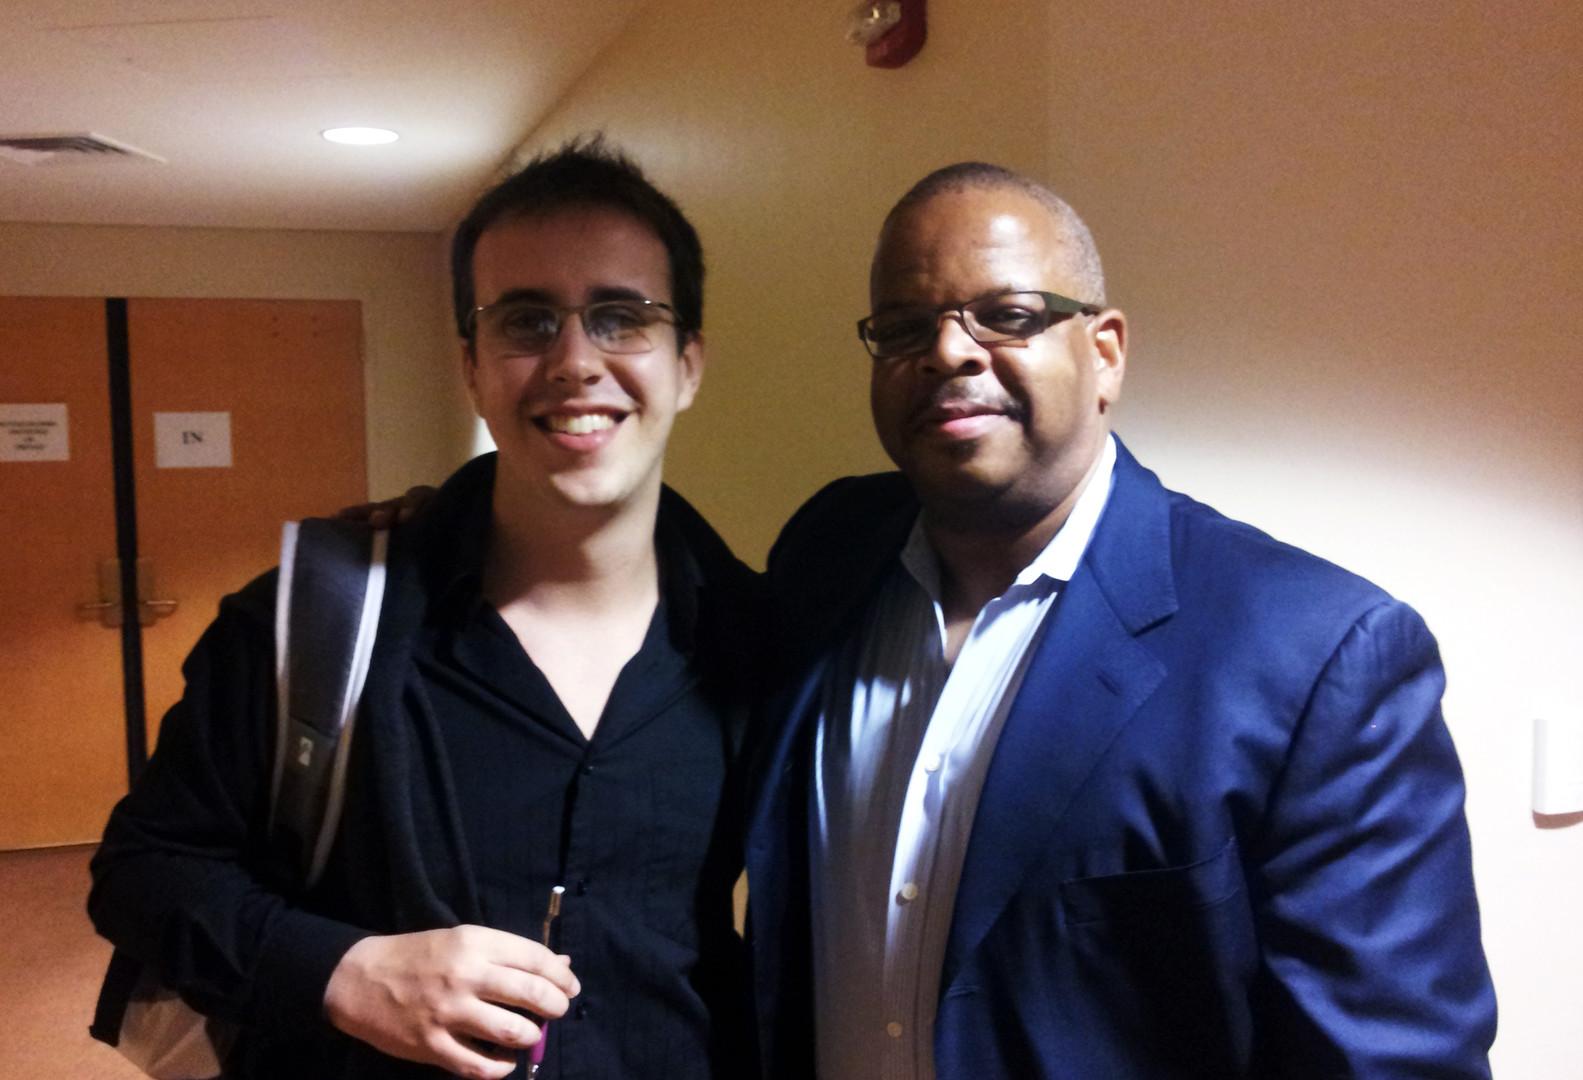 Rafael Piccolotto de Lima & Terence Blanchard